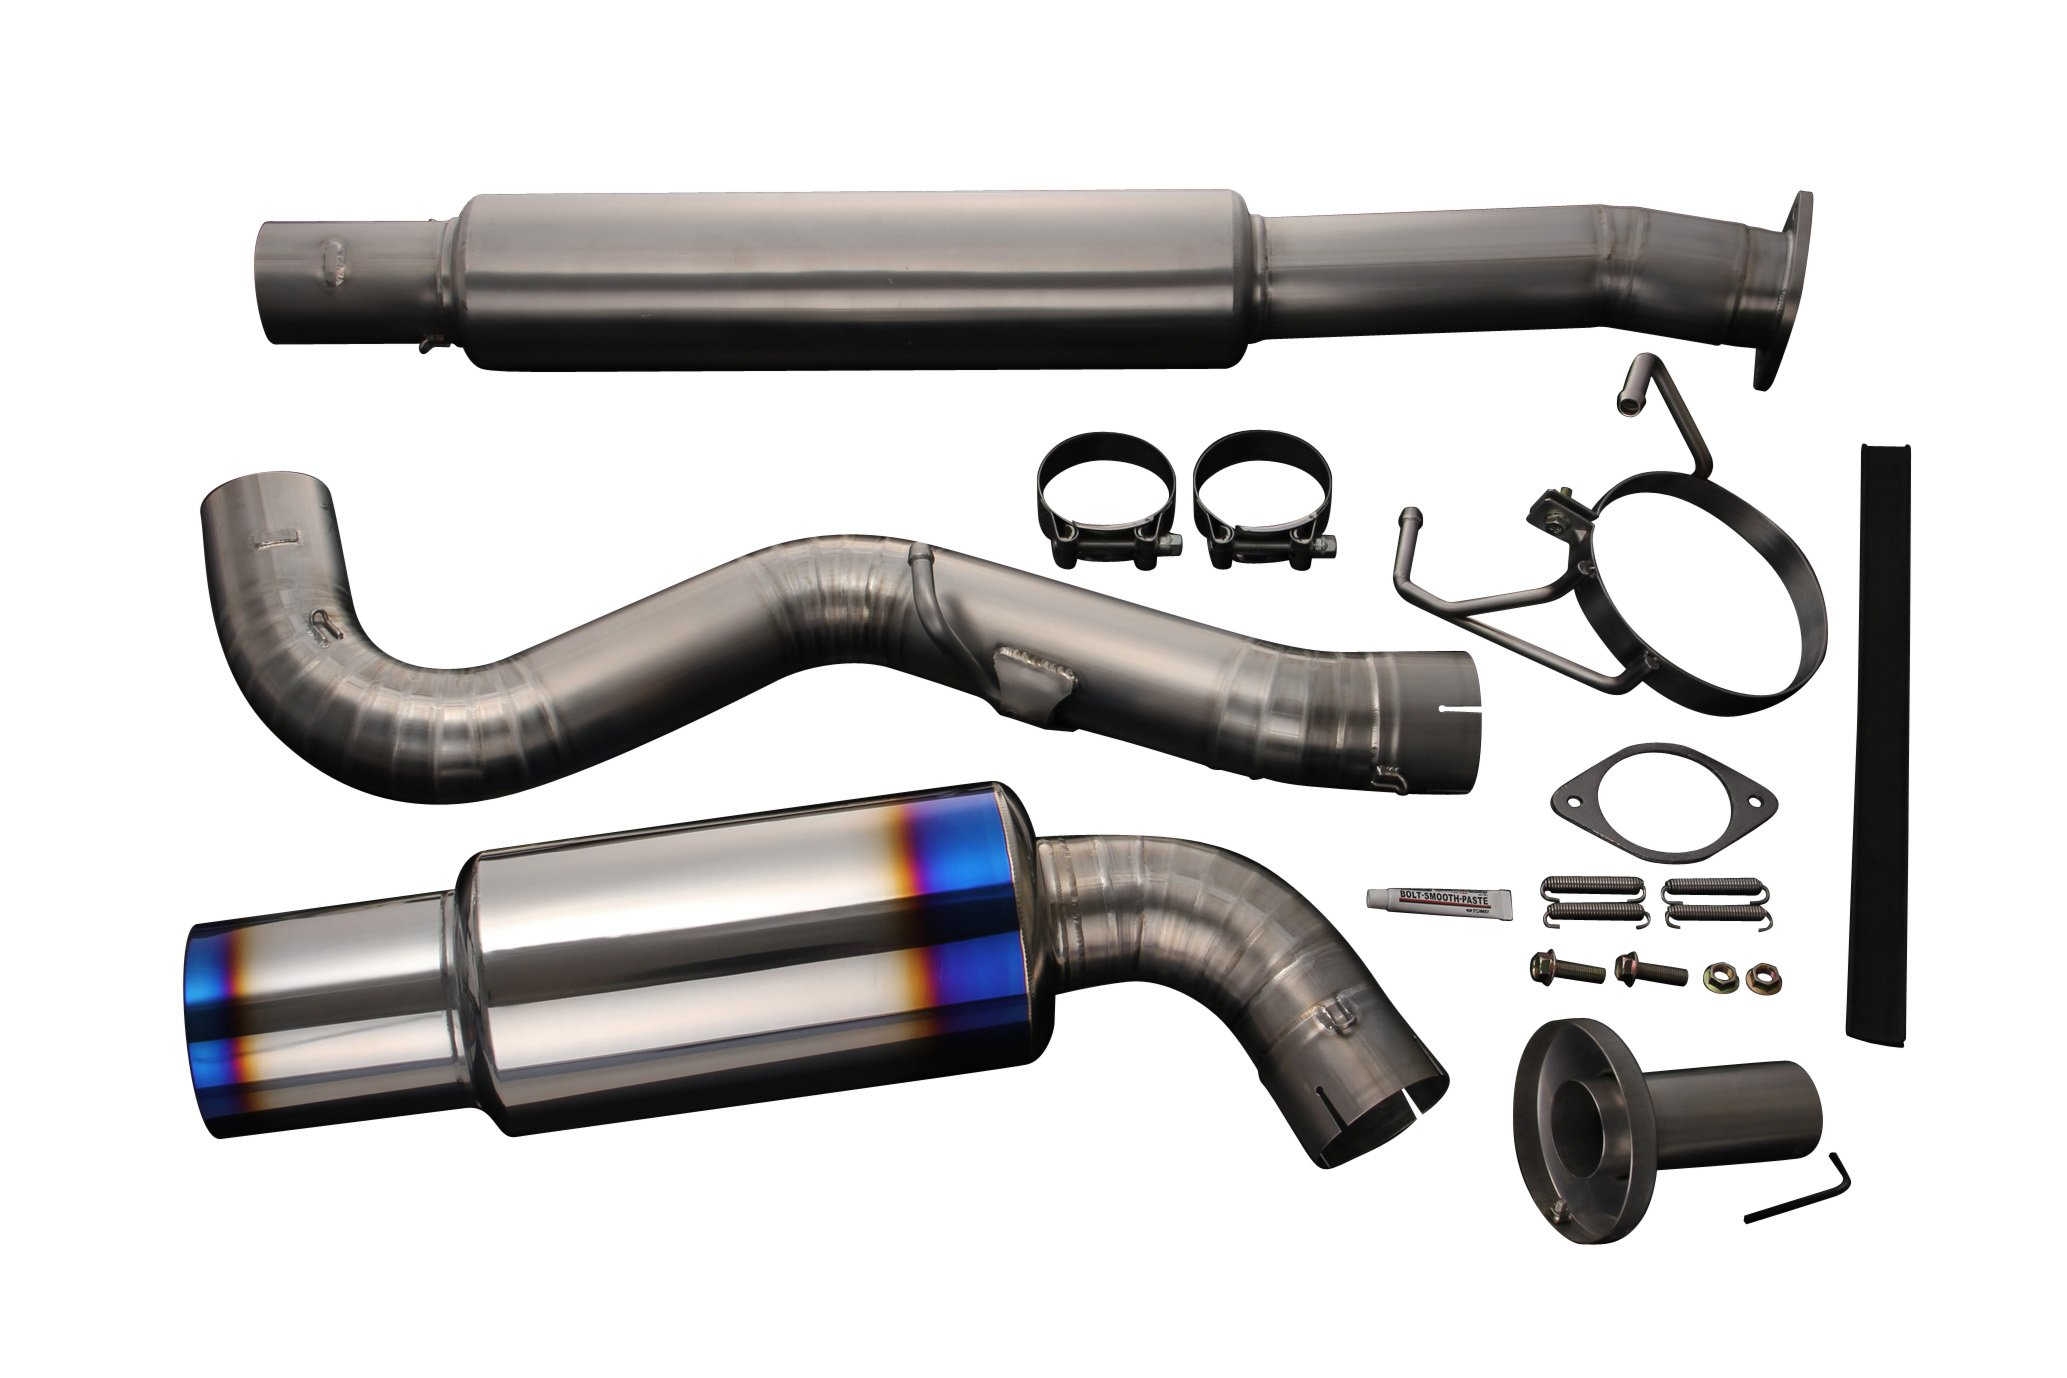 Buy Tomei TB6110-NS02A Expreme Ti Full Titanium Mid Y-Pipe